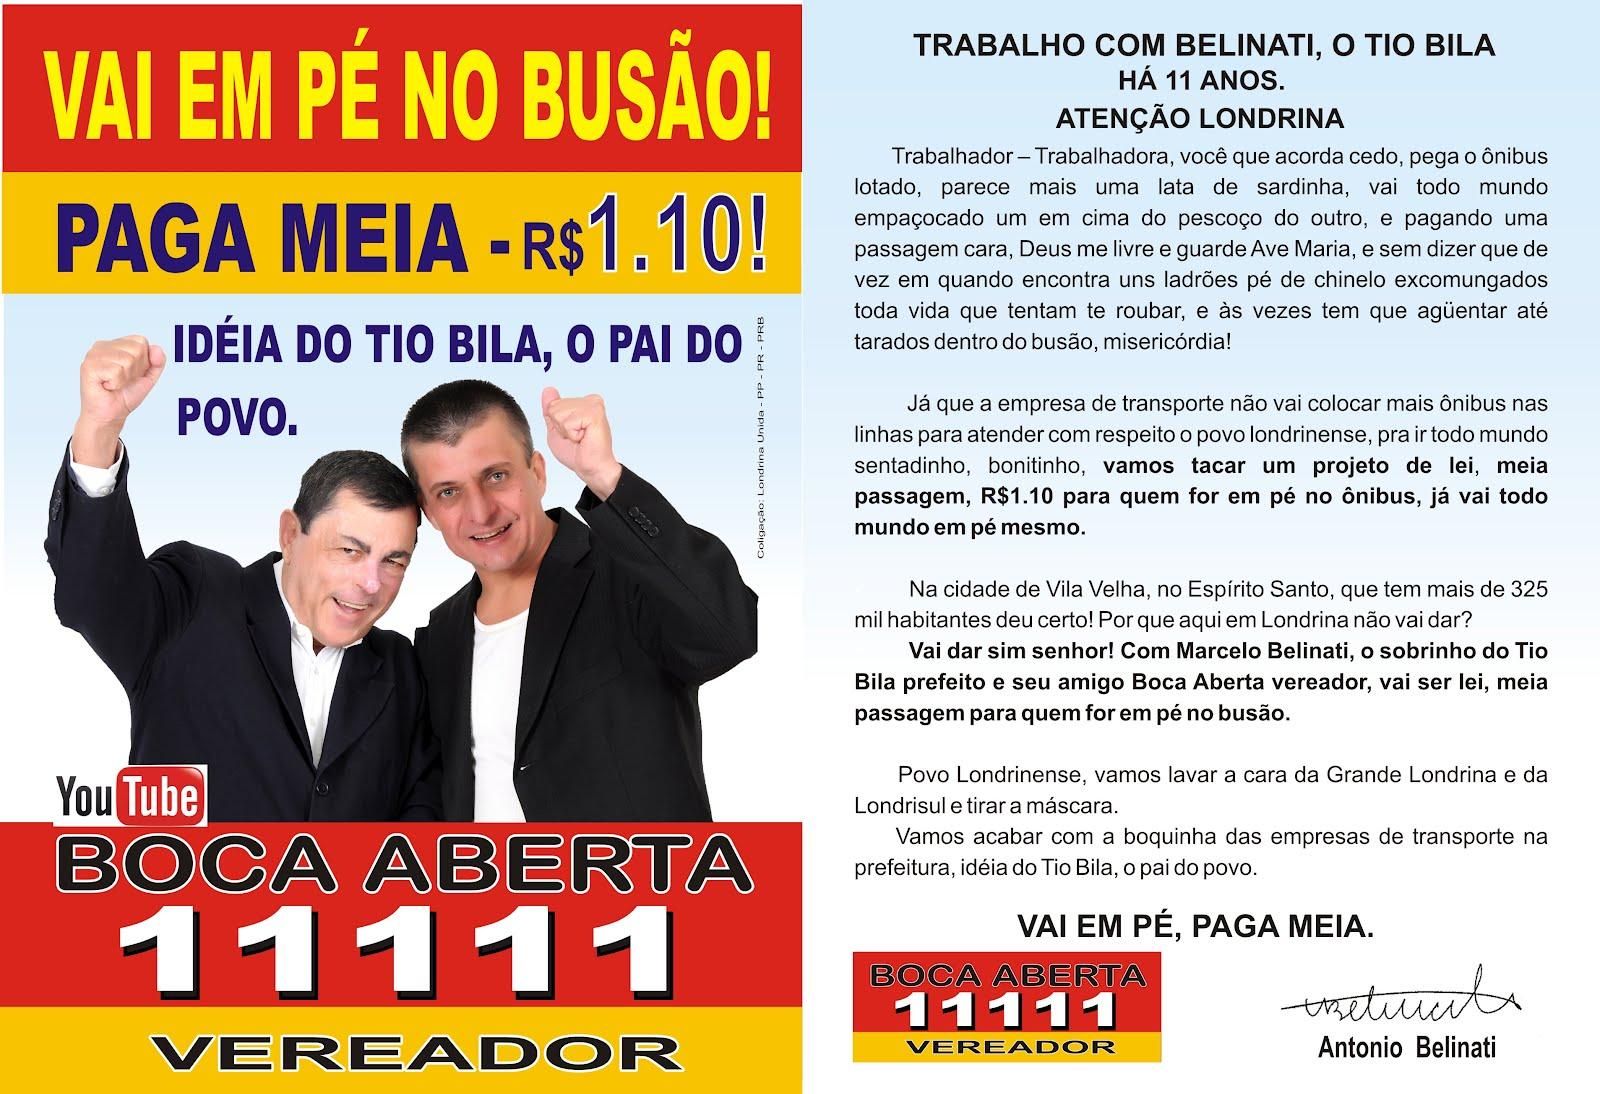 AMIGO BOCA-ABERTA